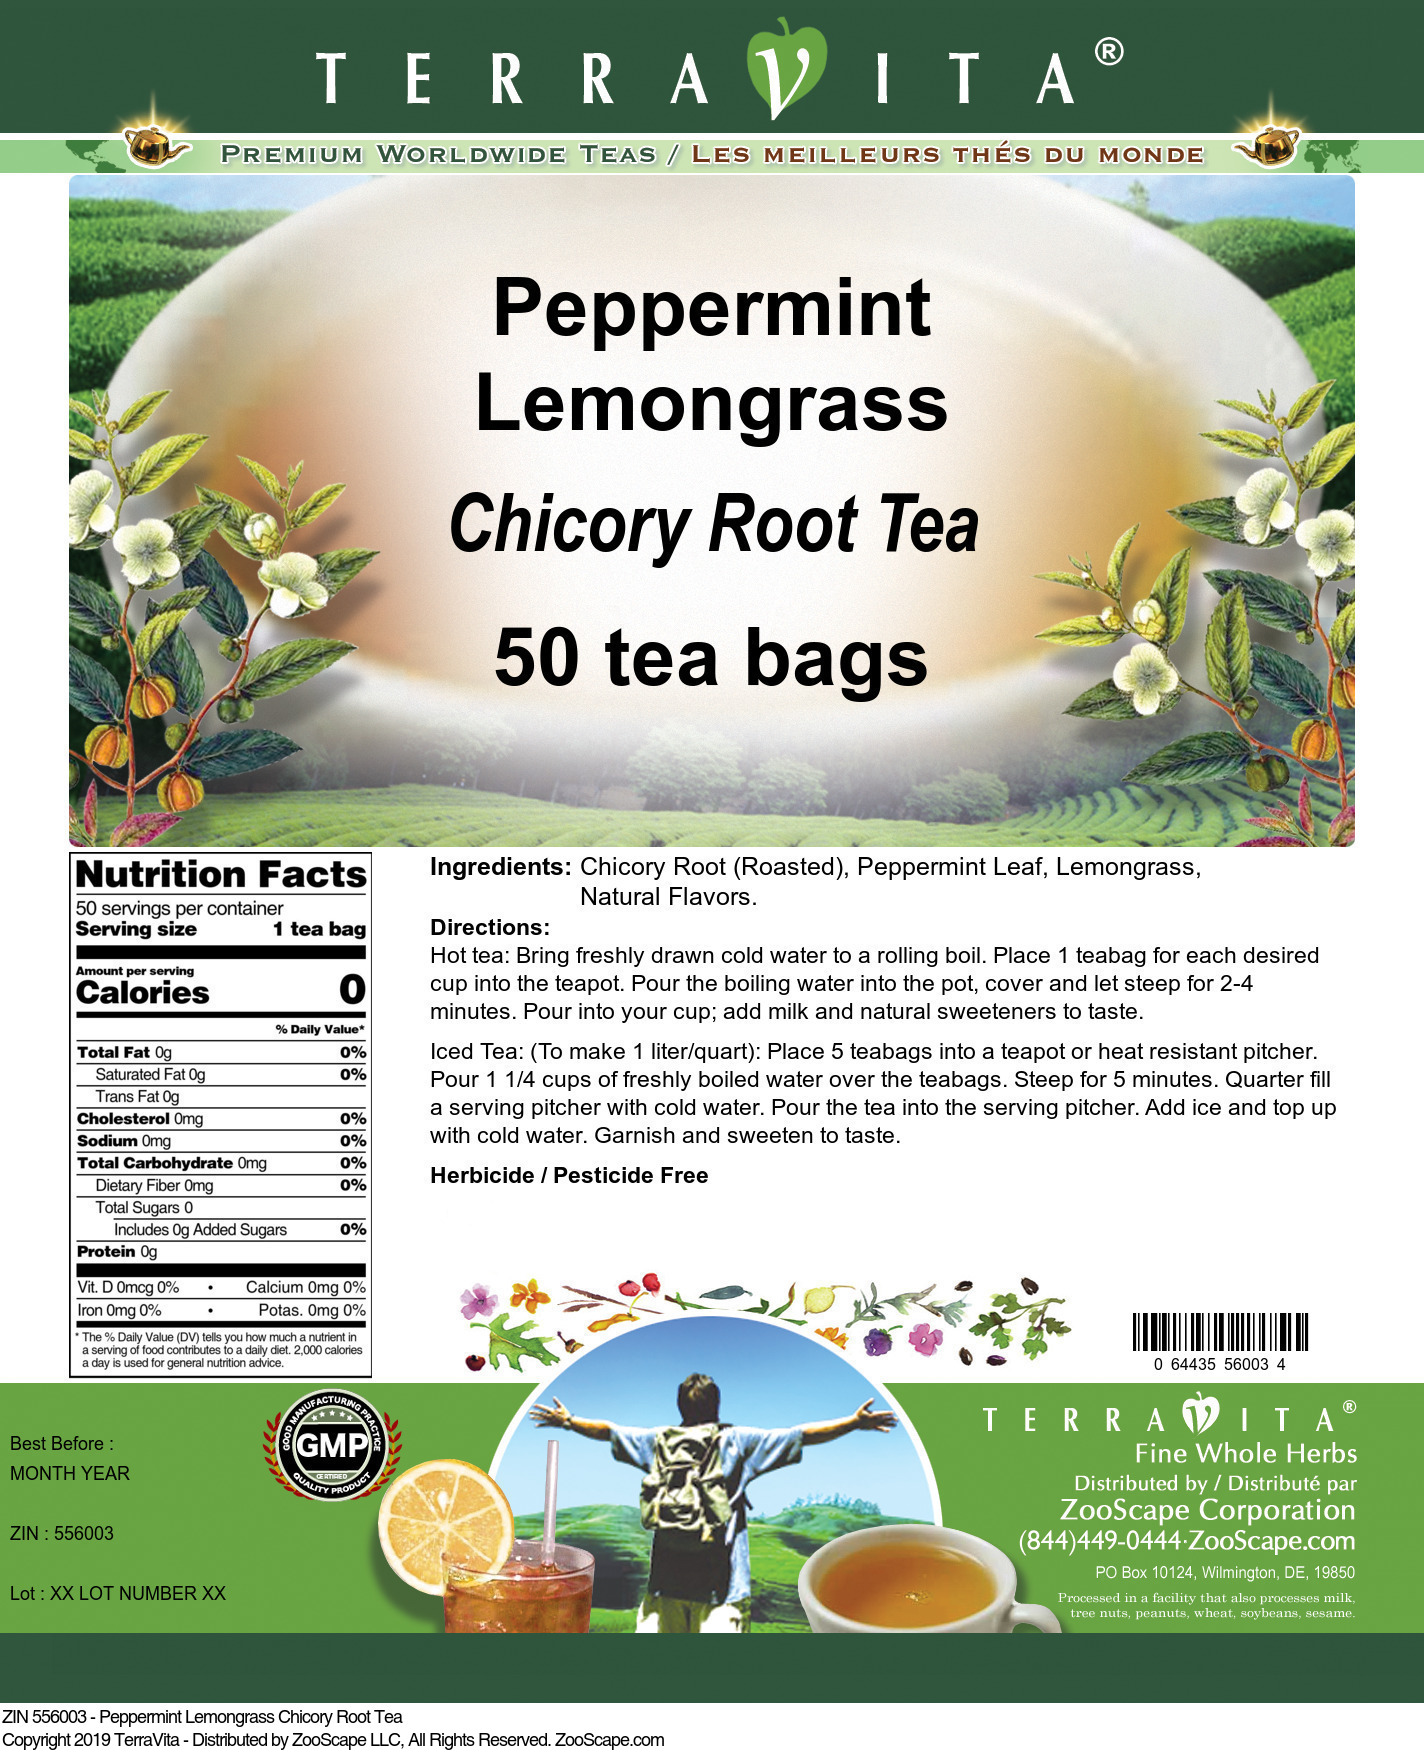 Peppermint Lemongrass Chicory Root